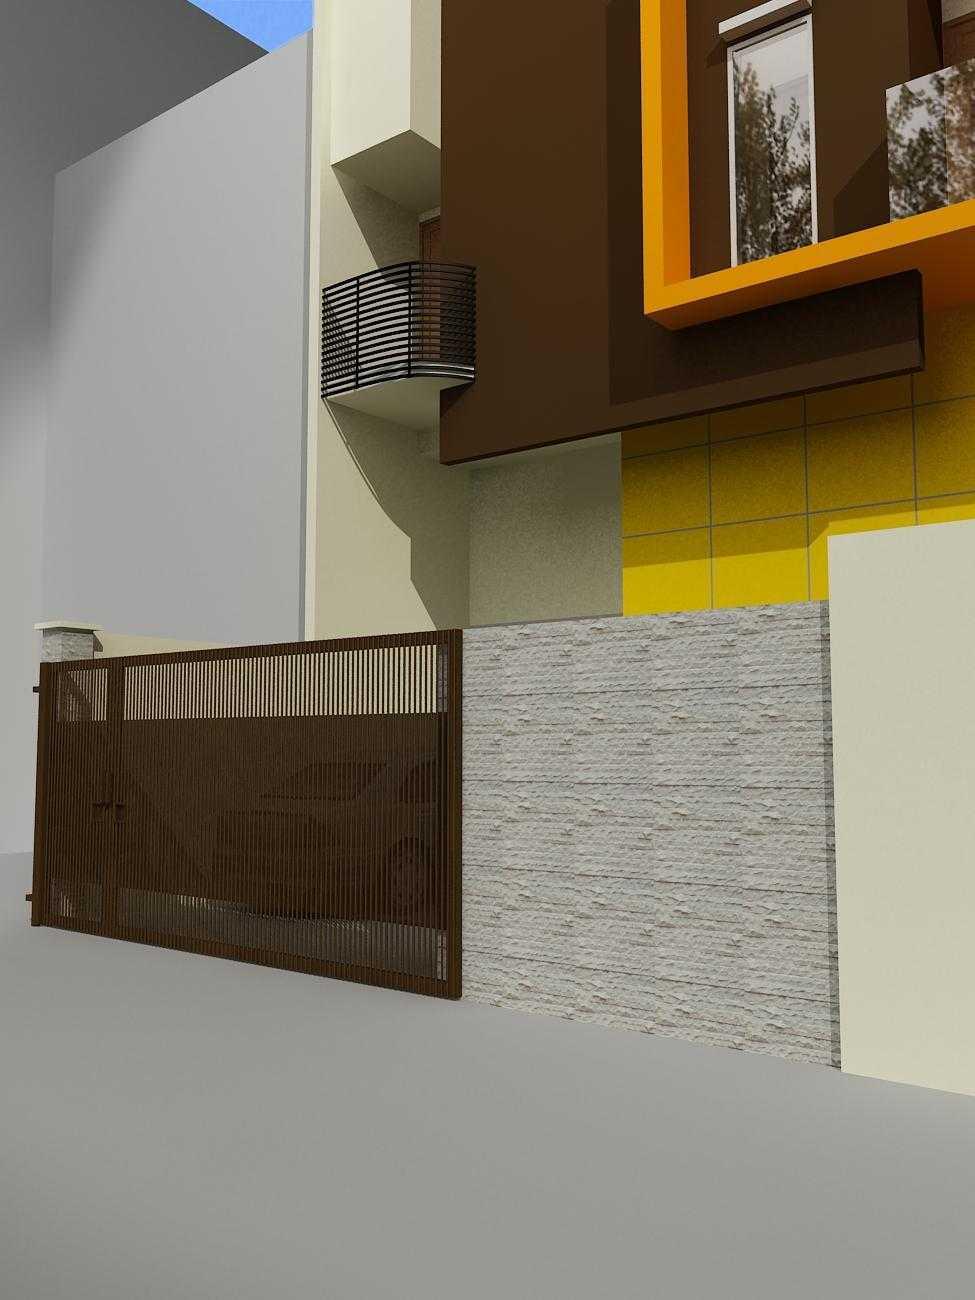 Ir. Susanto Sjamsuddin Box House Tomang, Grogol Petamburan, West Jakarta City, Jakarta, Indonesia Tomang, Grogol Petamburan, West Jakarta City, Jakarta, Indonesia Img1259 Minimalis 35530